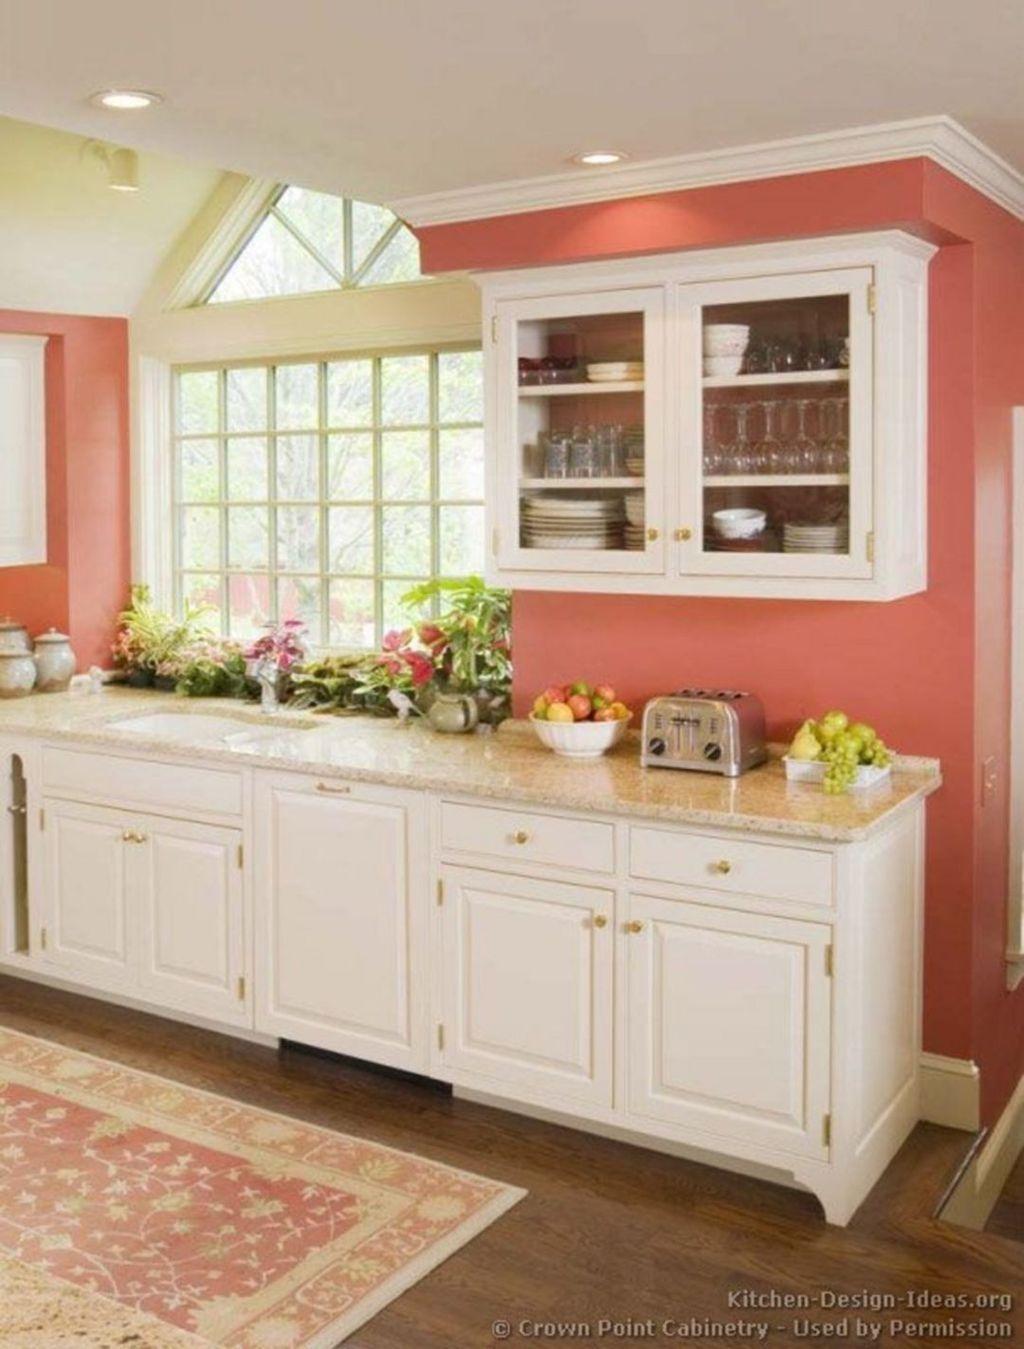 20 Unordinary Kitchen Colors Design Ideas That Looks Cool Custom Kitchen Cabinets Design Traditional White Kitchen Cabinets White Kitchen Traditional